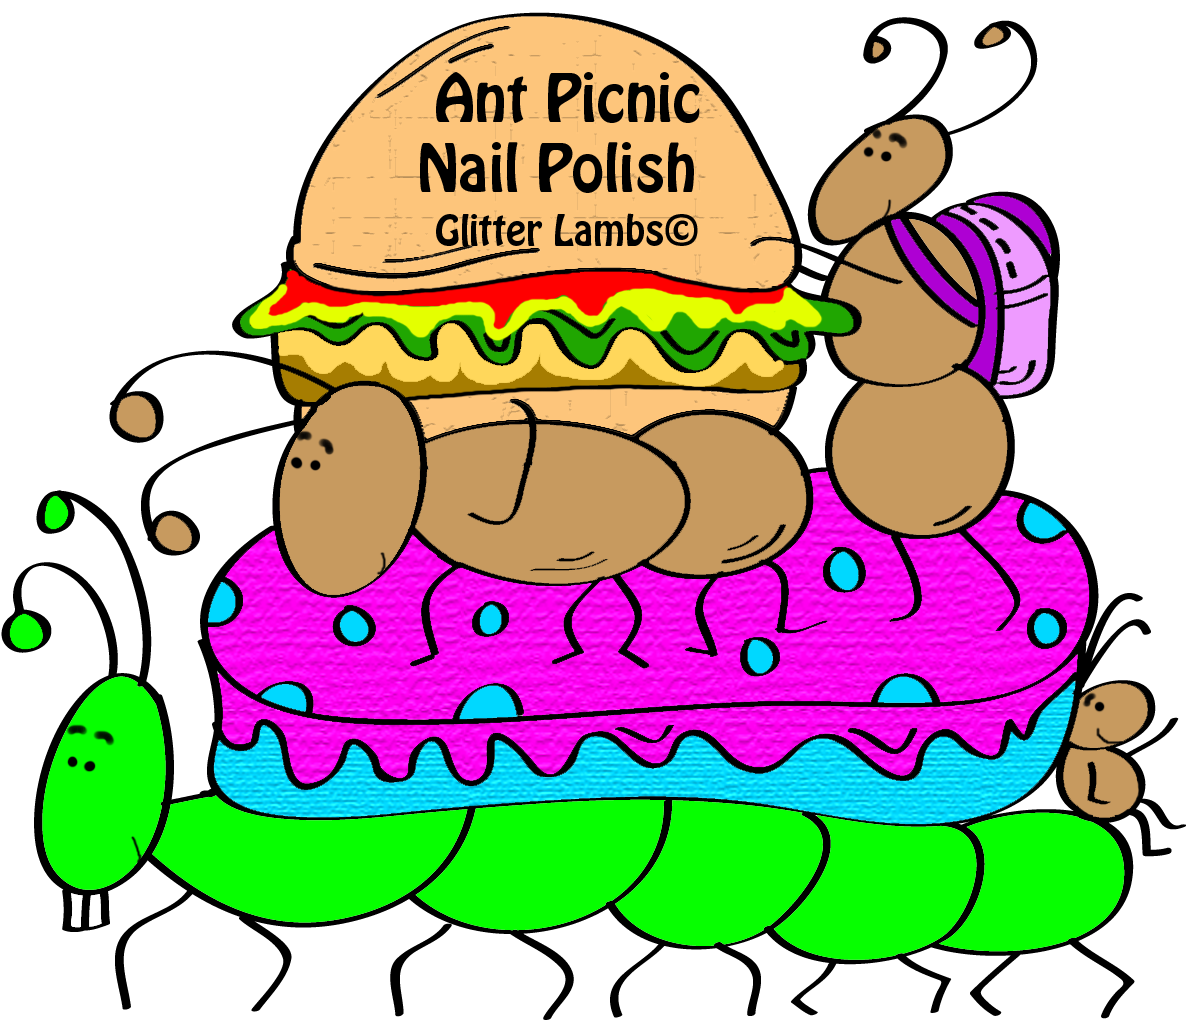 ANT PICNIC Glitter Topper Nail Polish By Glitter Lambs